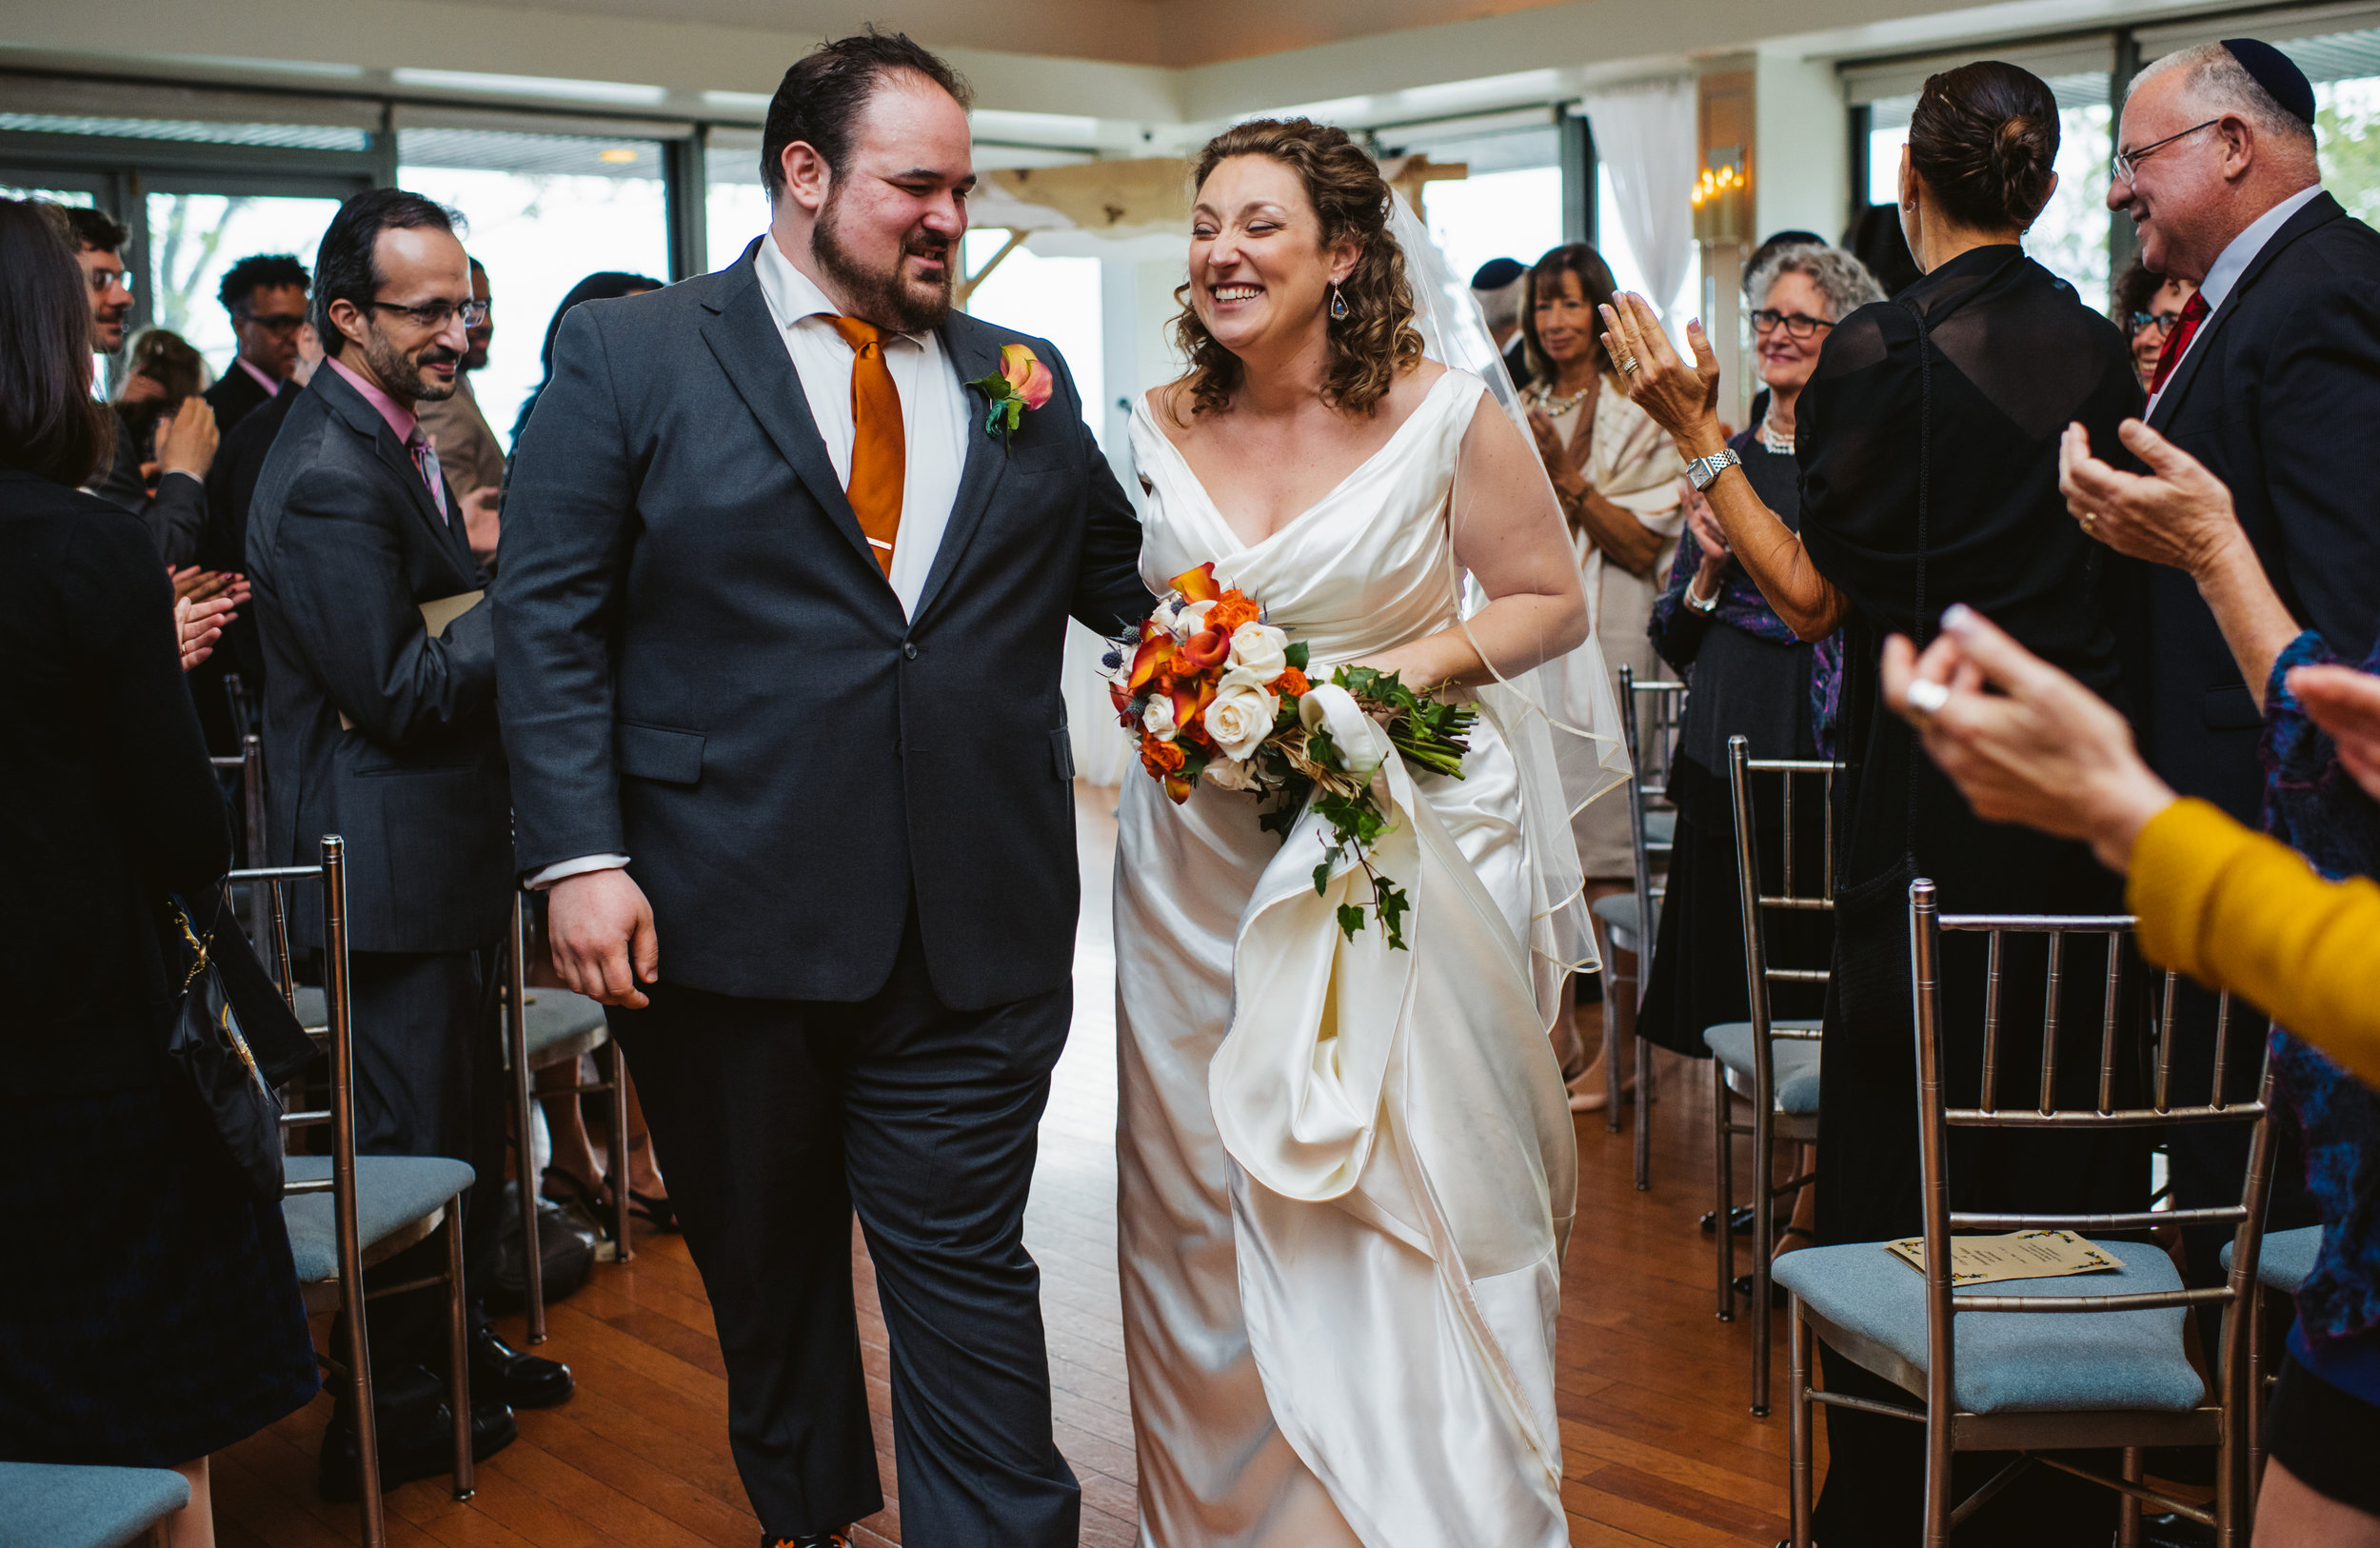 LIZA & JON - BATTERY PARK WEDDING - NYC INTIMATE WEDDING PHOTOGRAPHER - CHI-CHI AGBIM-490.jpg